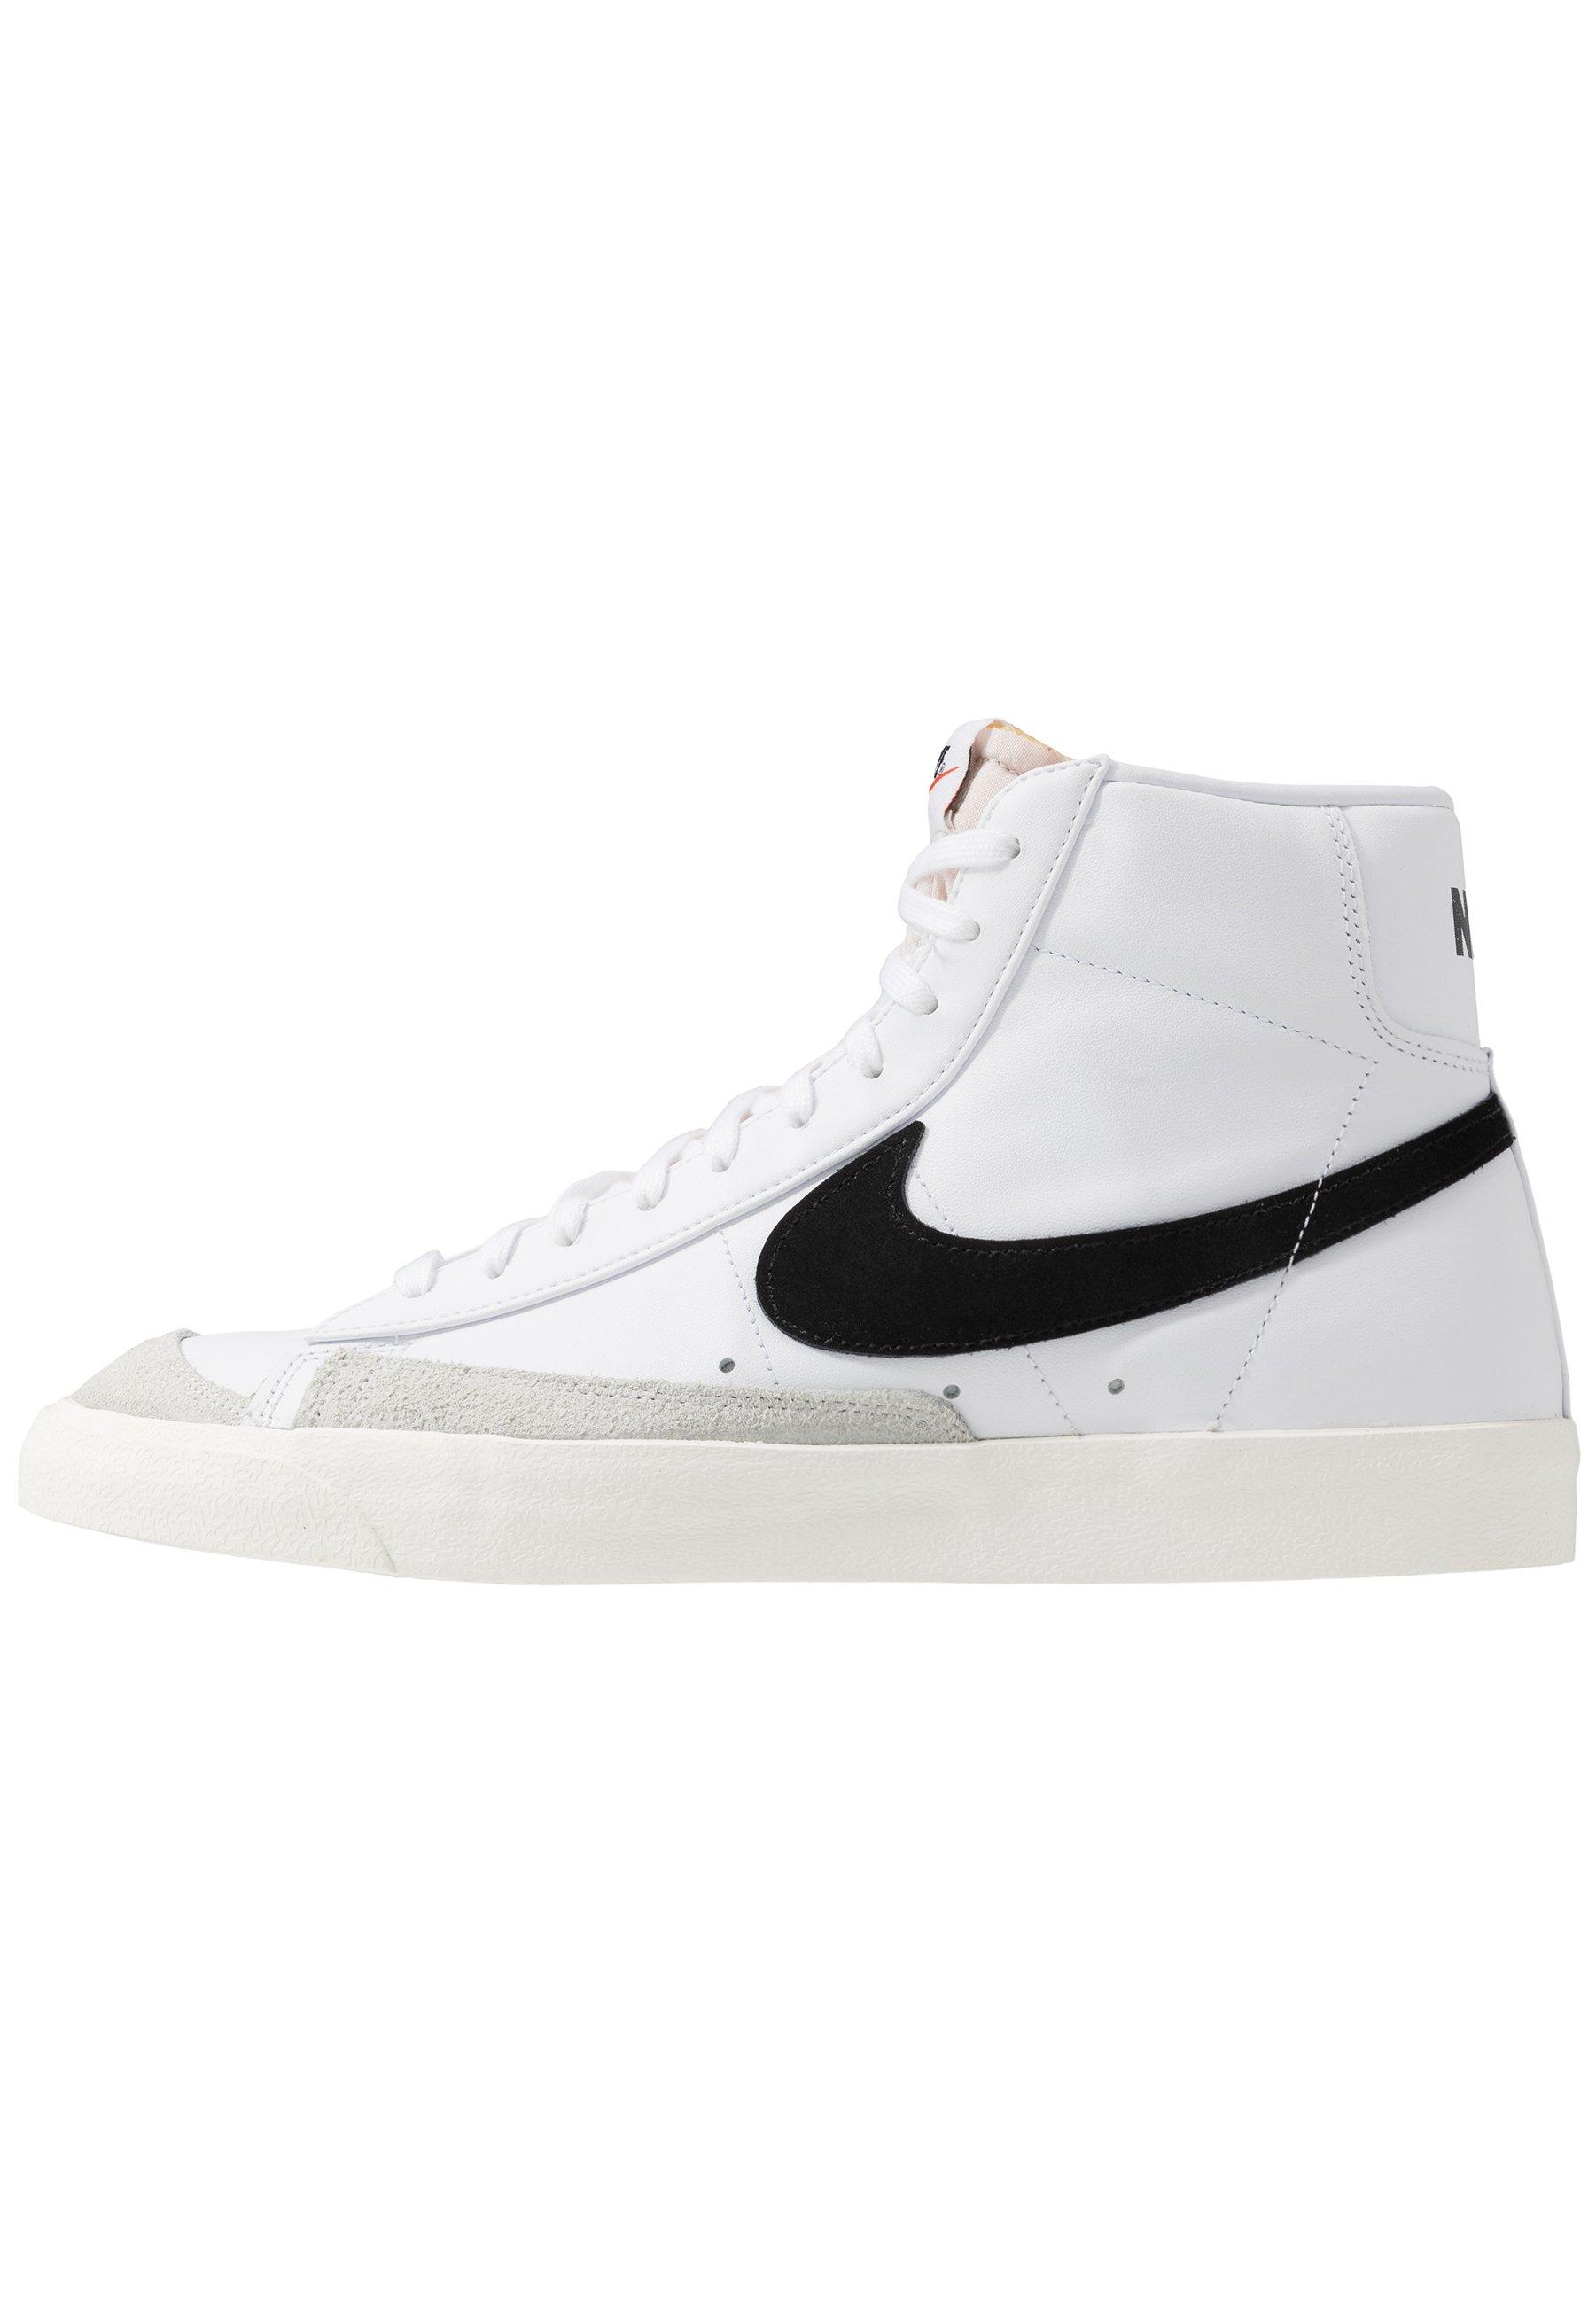 BLAZER MID '77 Sneakers alte whiteblack